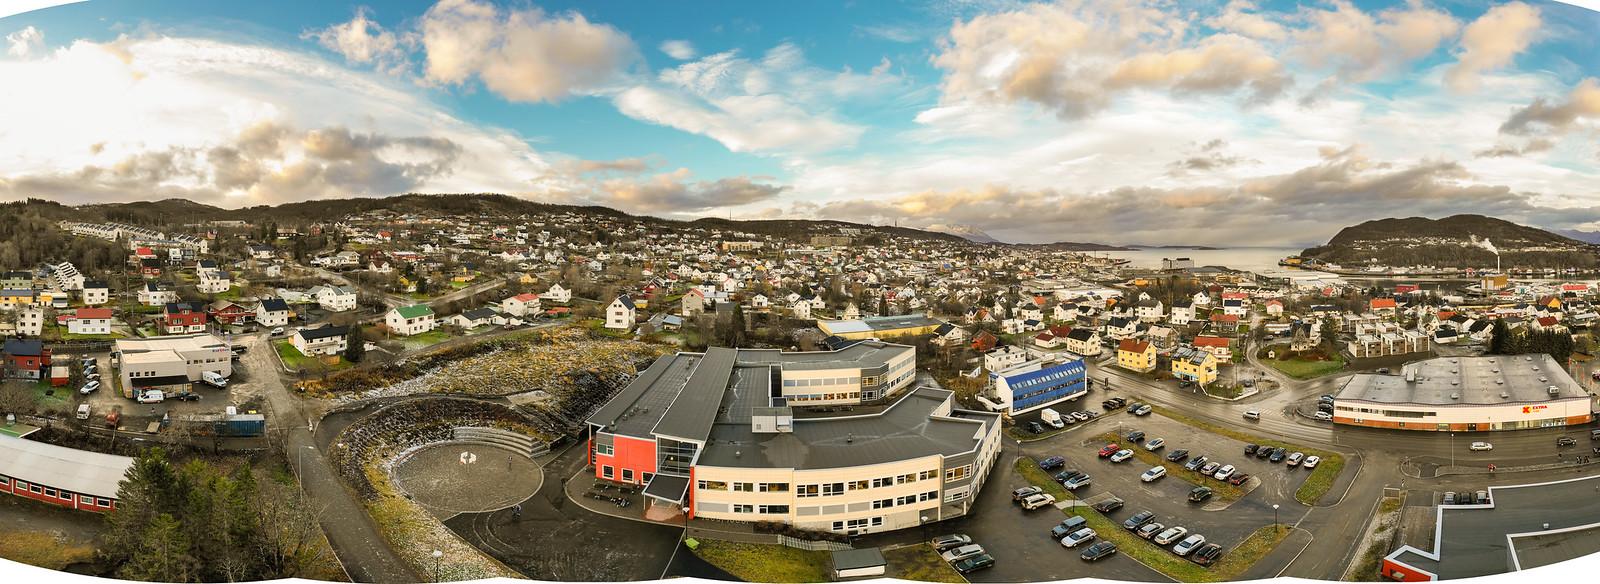 Seljestad drone panorama 2018